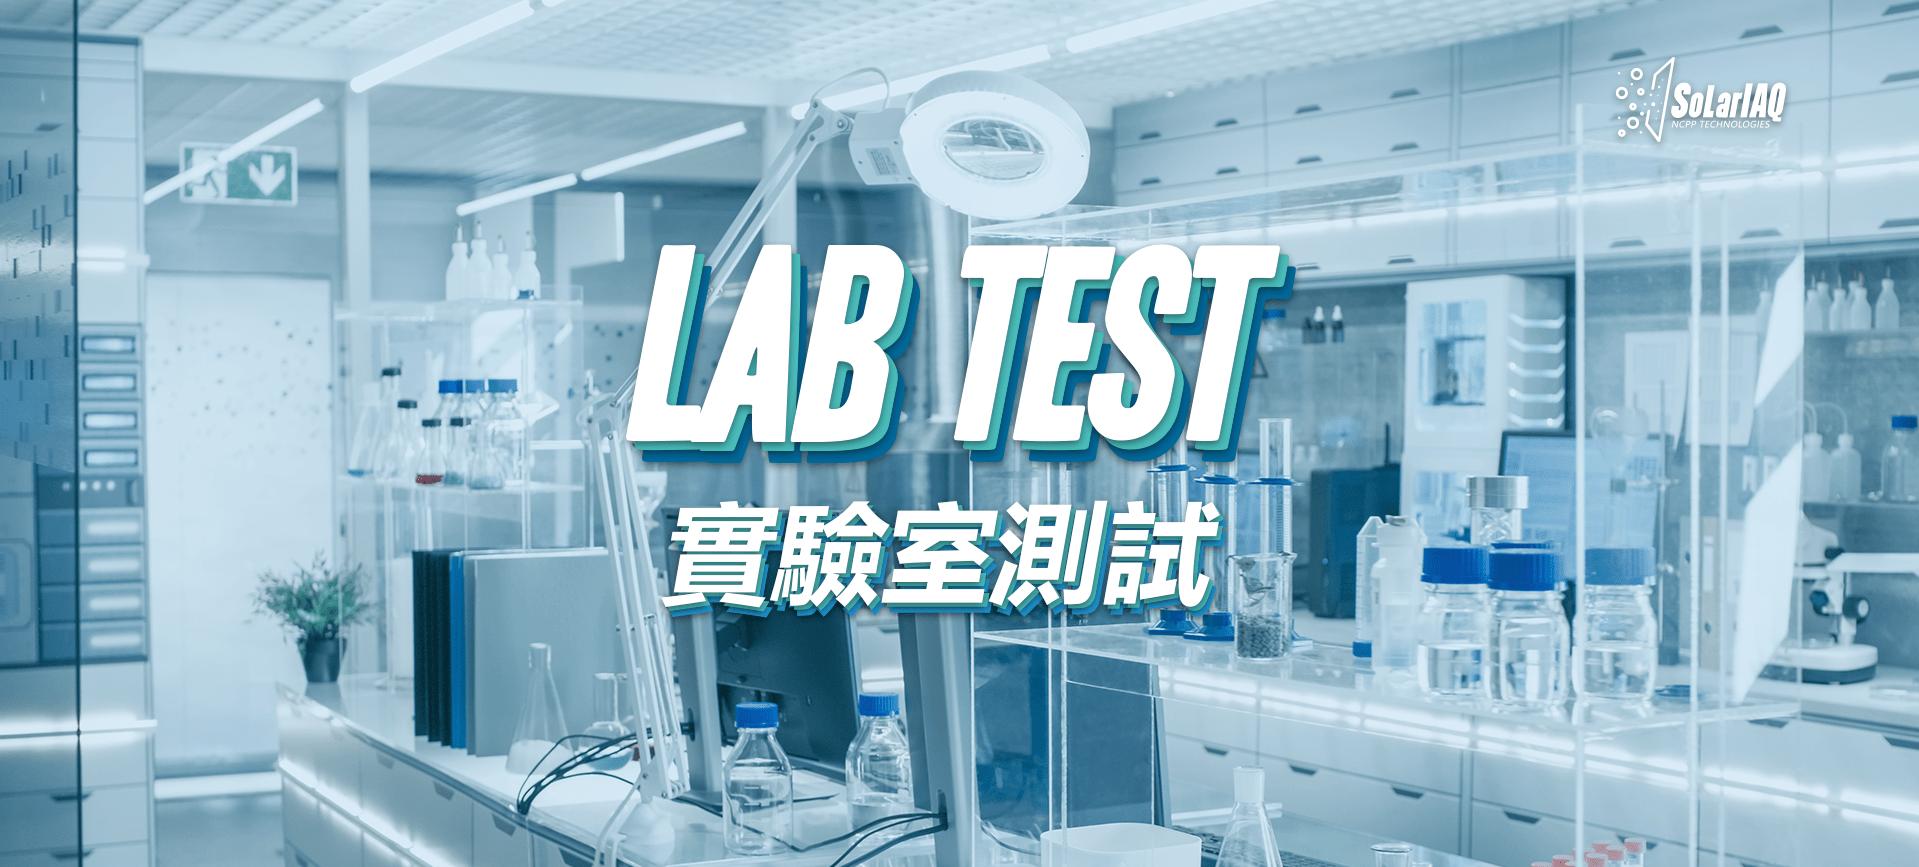 SolarIAQ - Lab Test